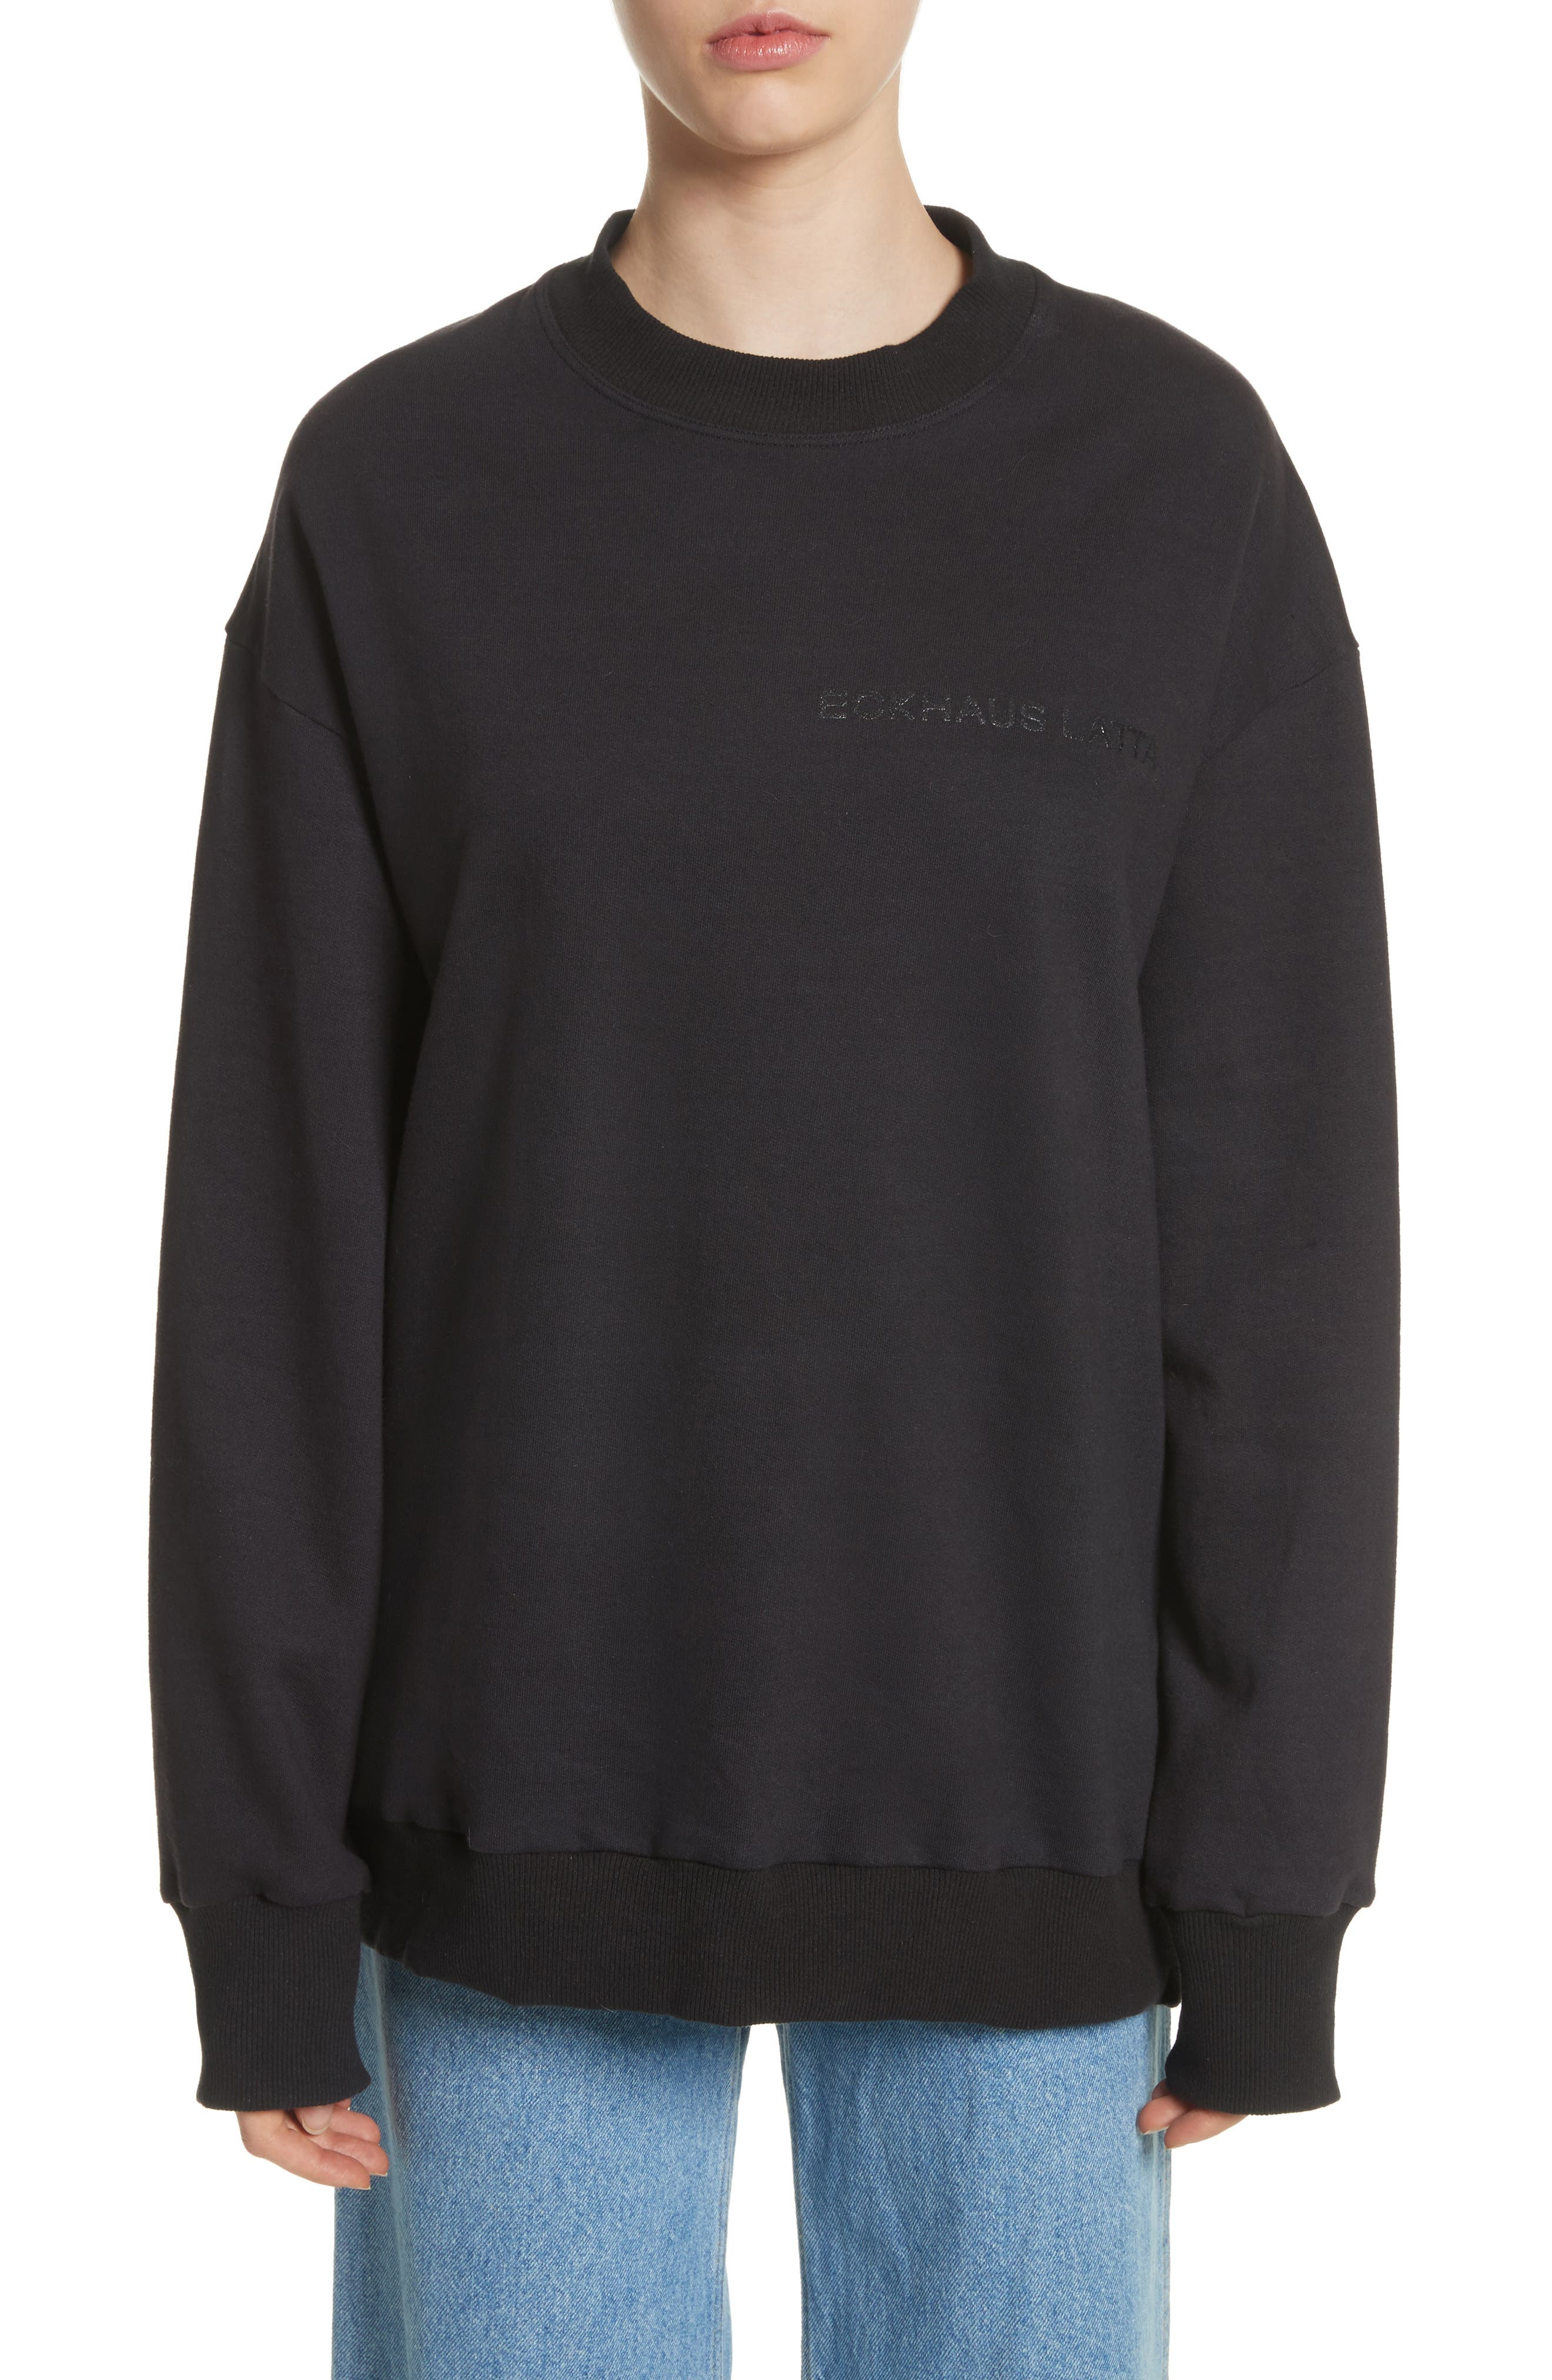 Relaxed Fit Sweatshirt,                             Main thumbnail 1, color,                             Black